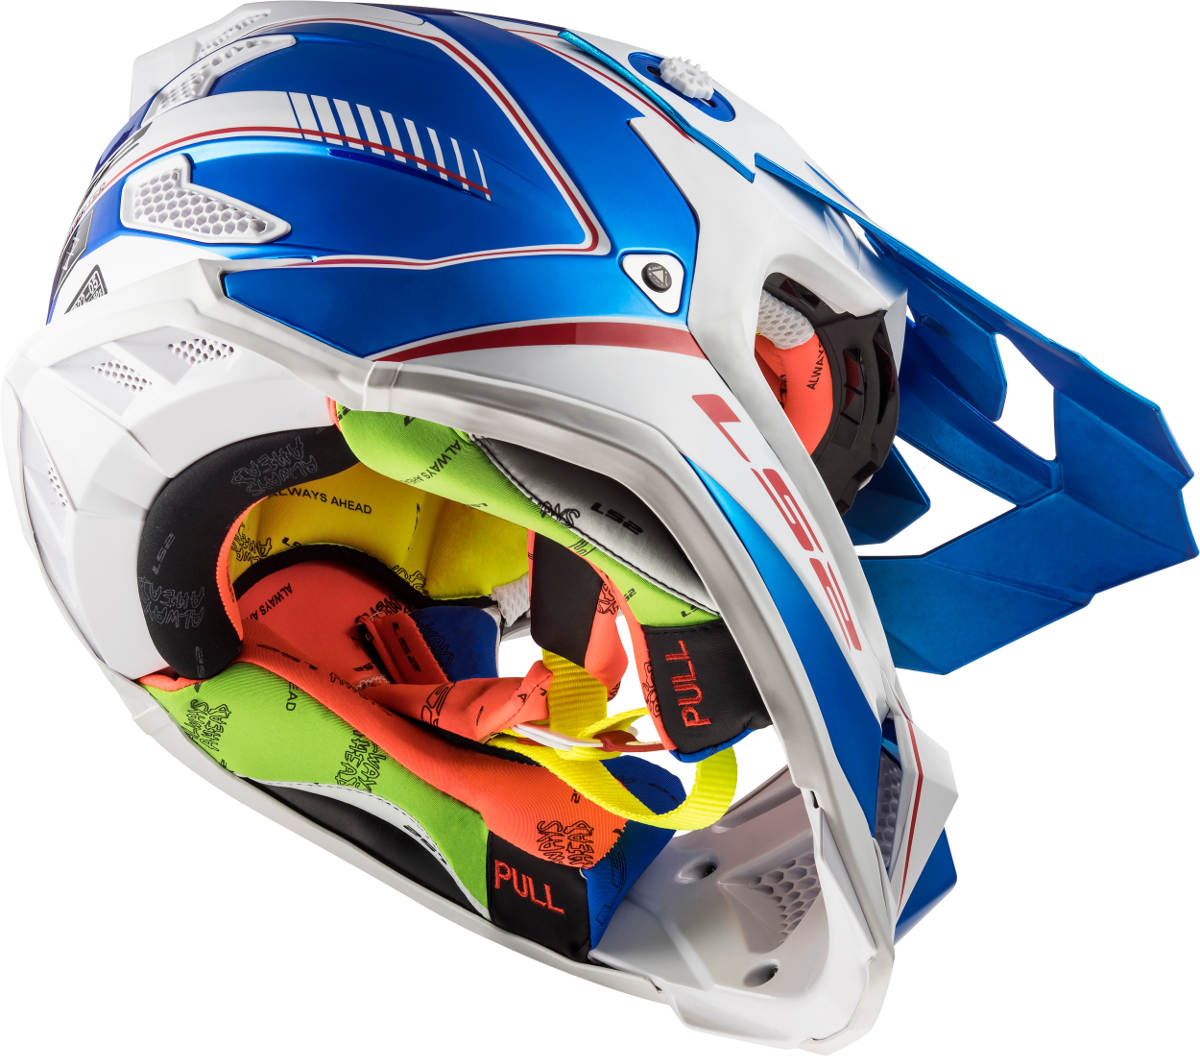 LS2 Subverter Helmet Power Design Underneath